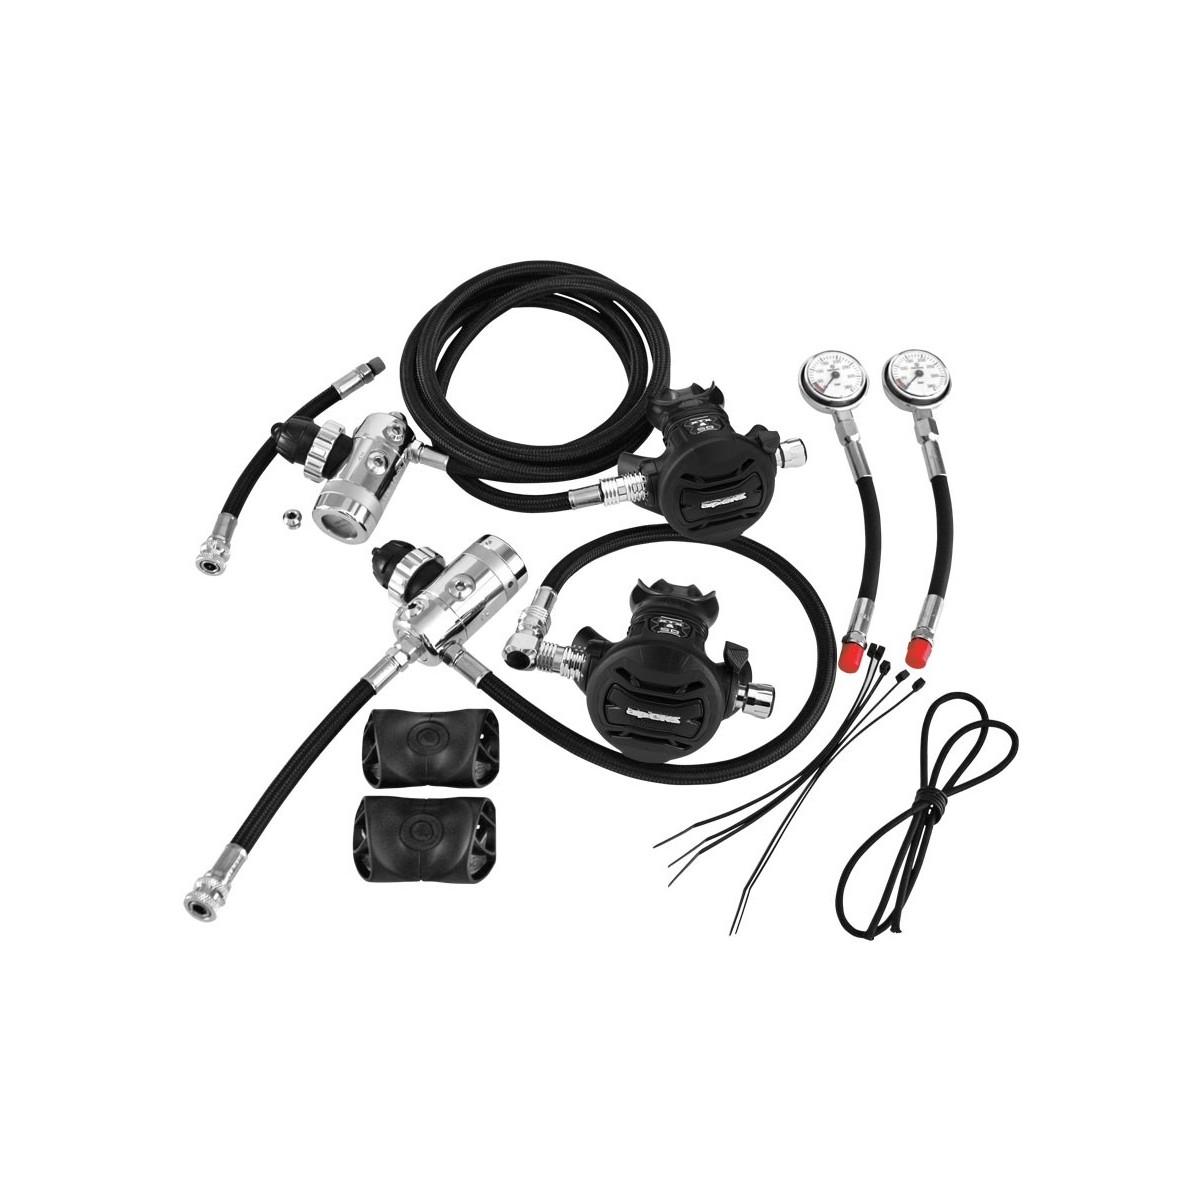 Apeks Sidemount Regulator Kit